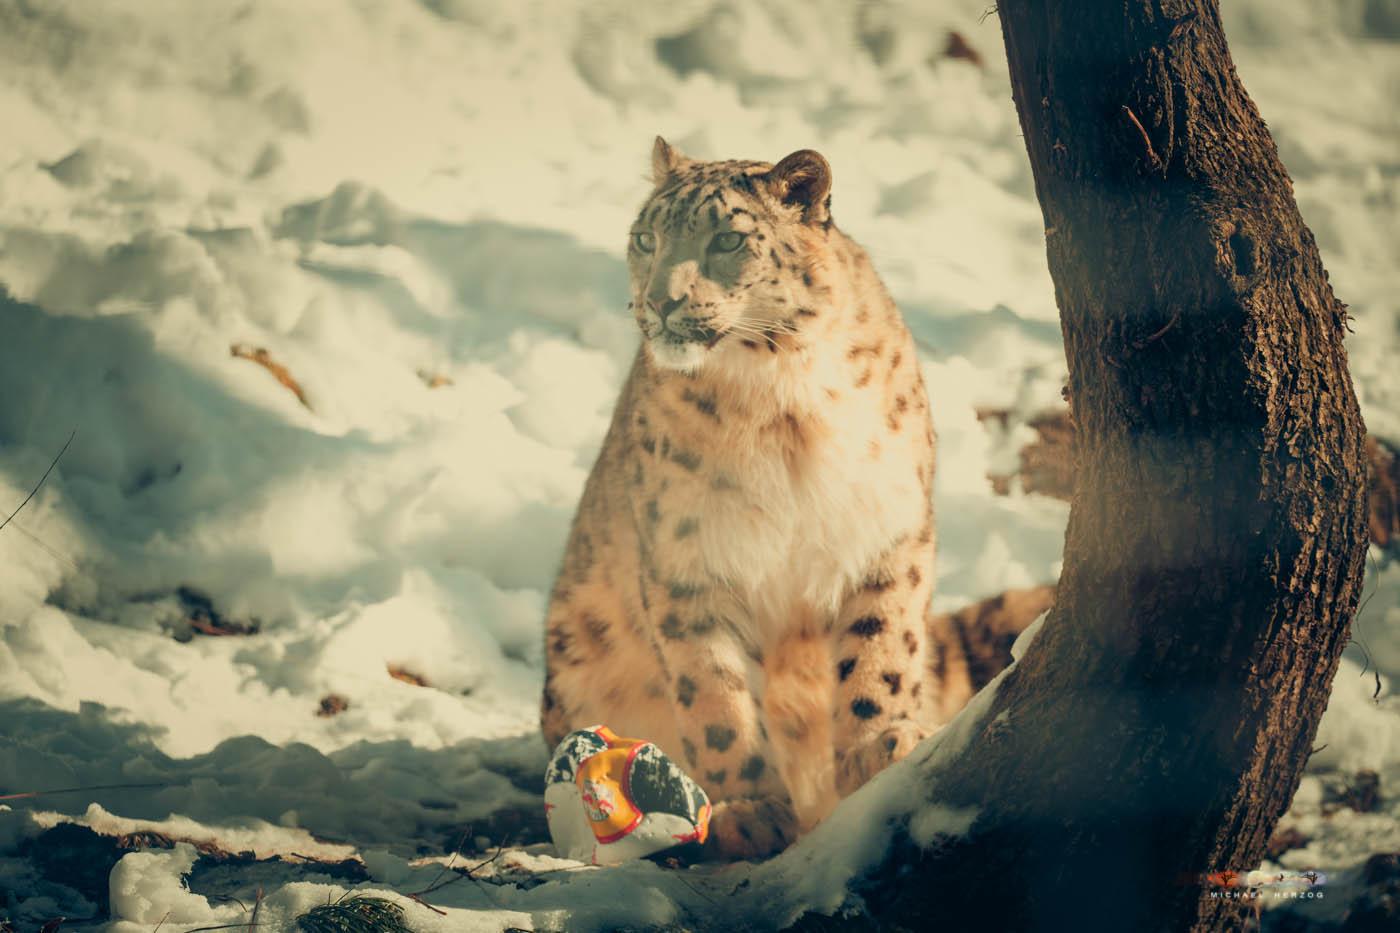 Zoo_Salzburg_MichaelHerzog-7530.jpg